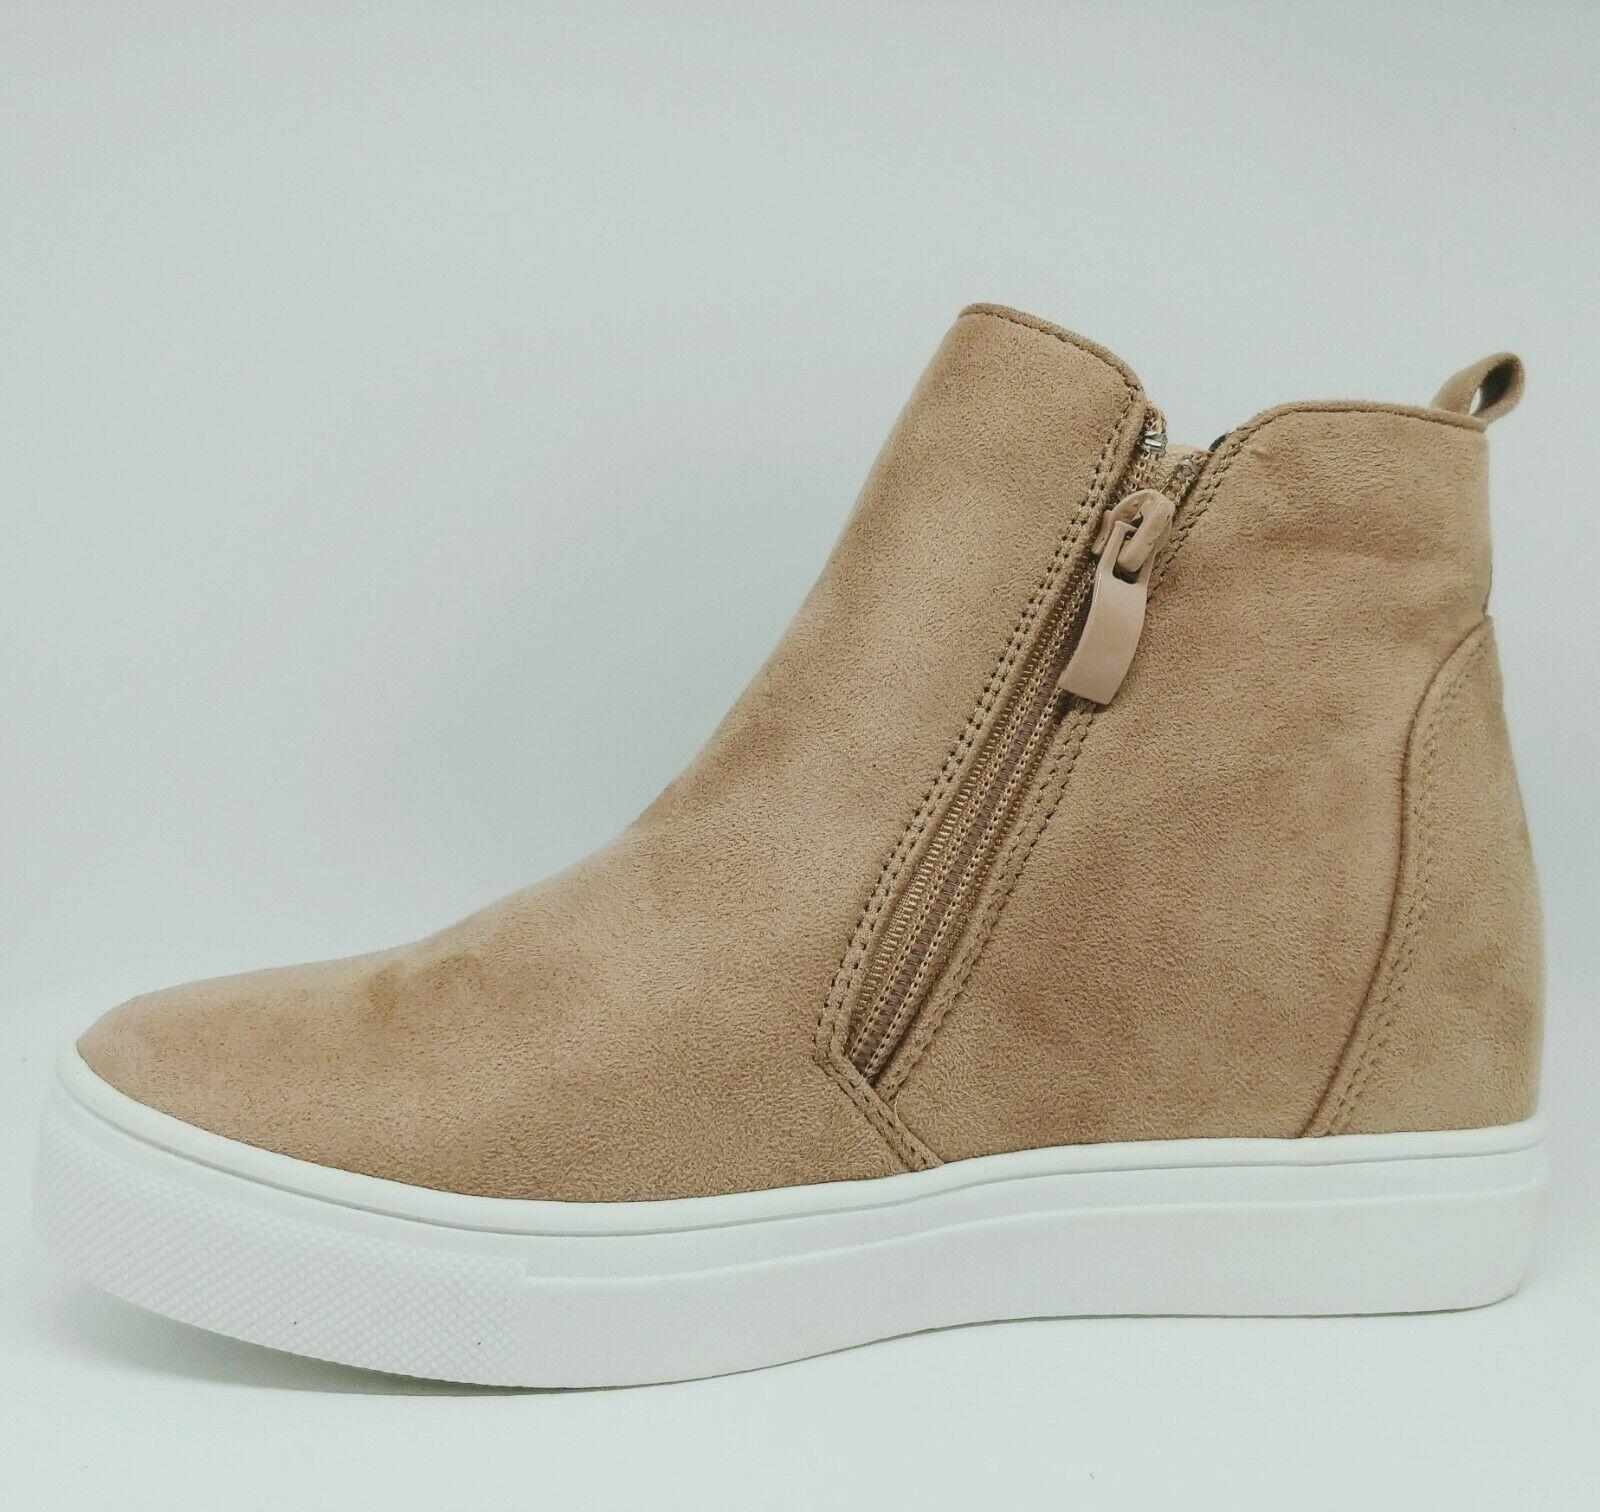 LaSheelah Taupe wedge sneakers